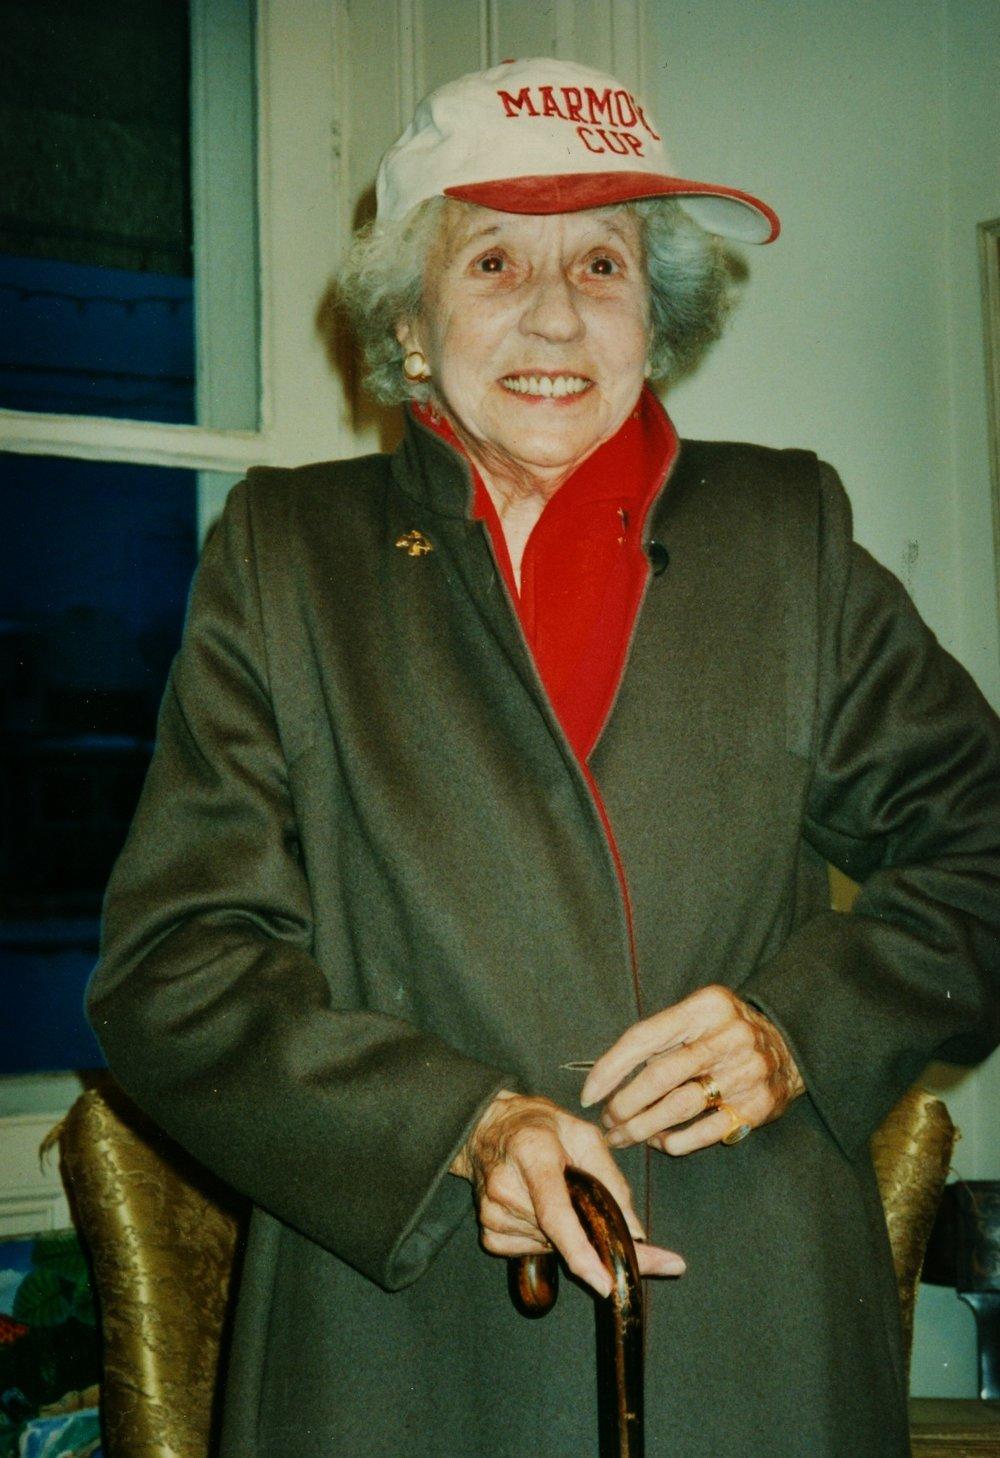 Helen Gaffney Jones Mantle getting ready for Snofest1995